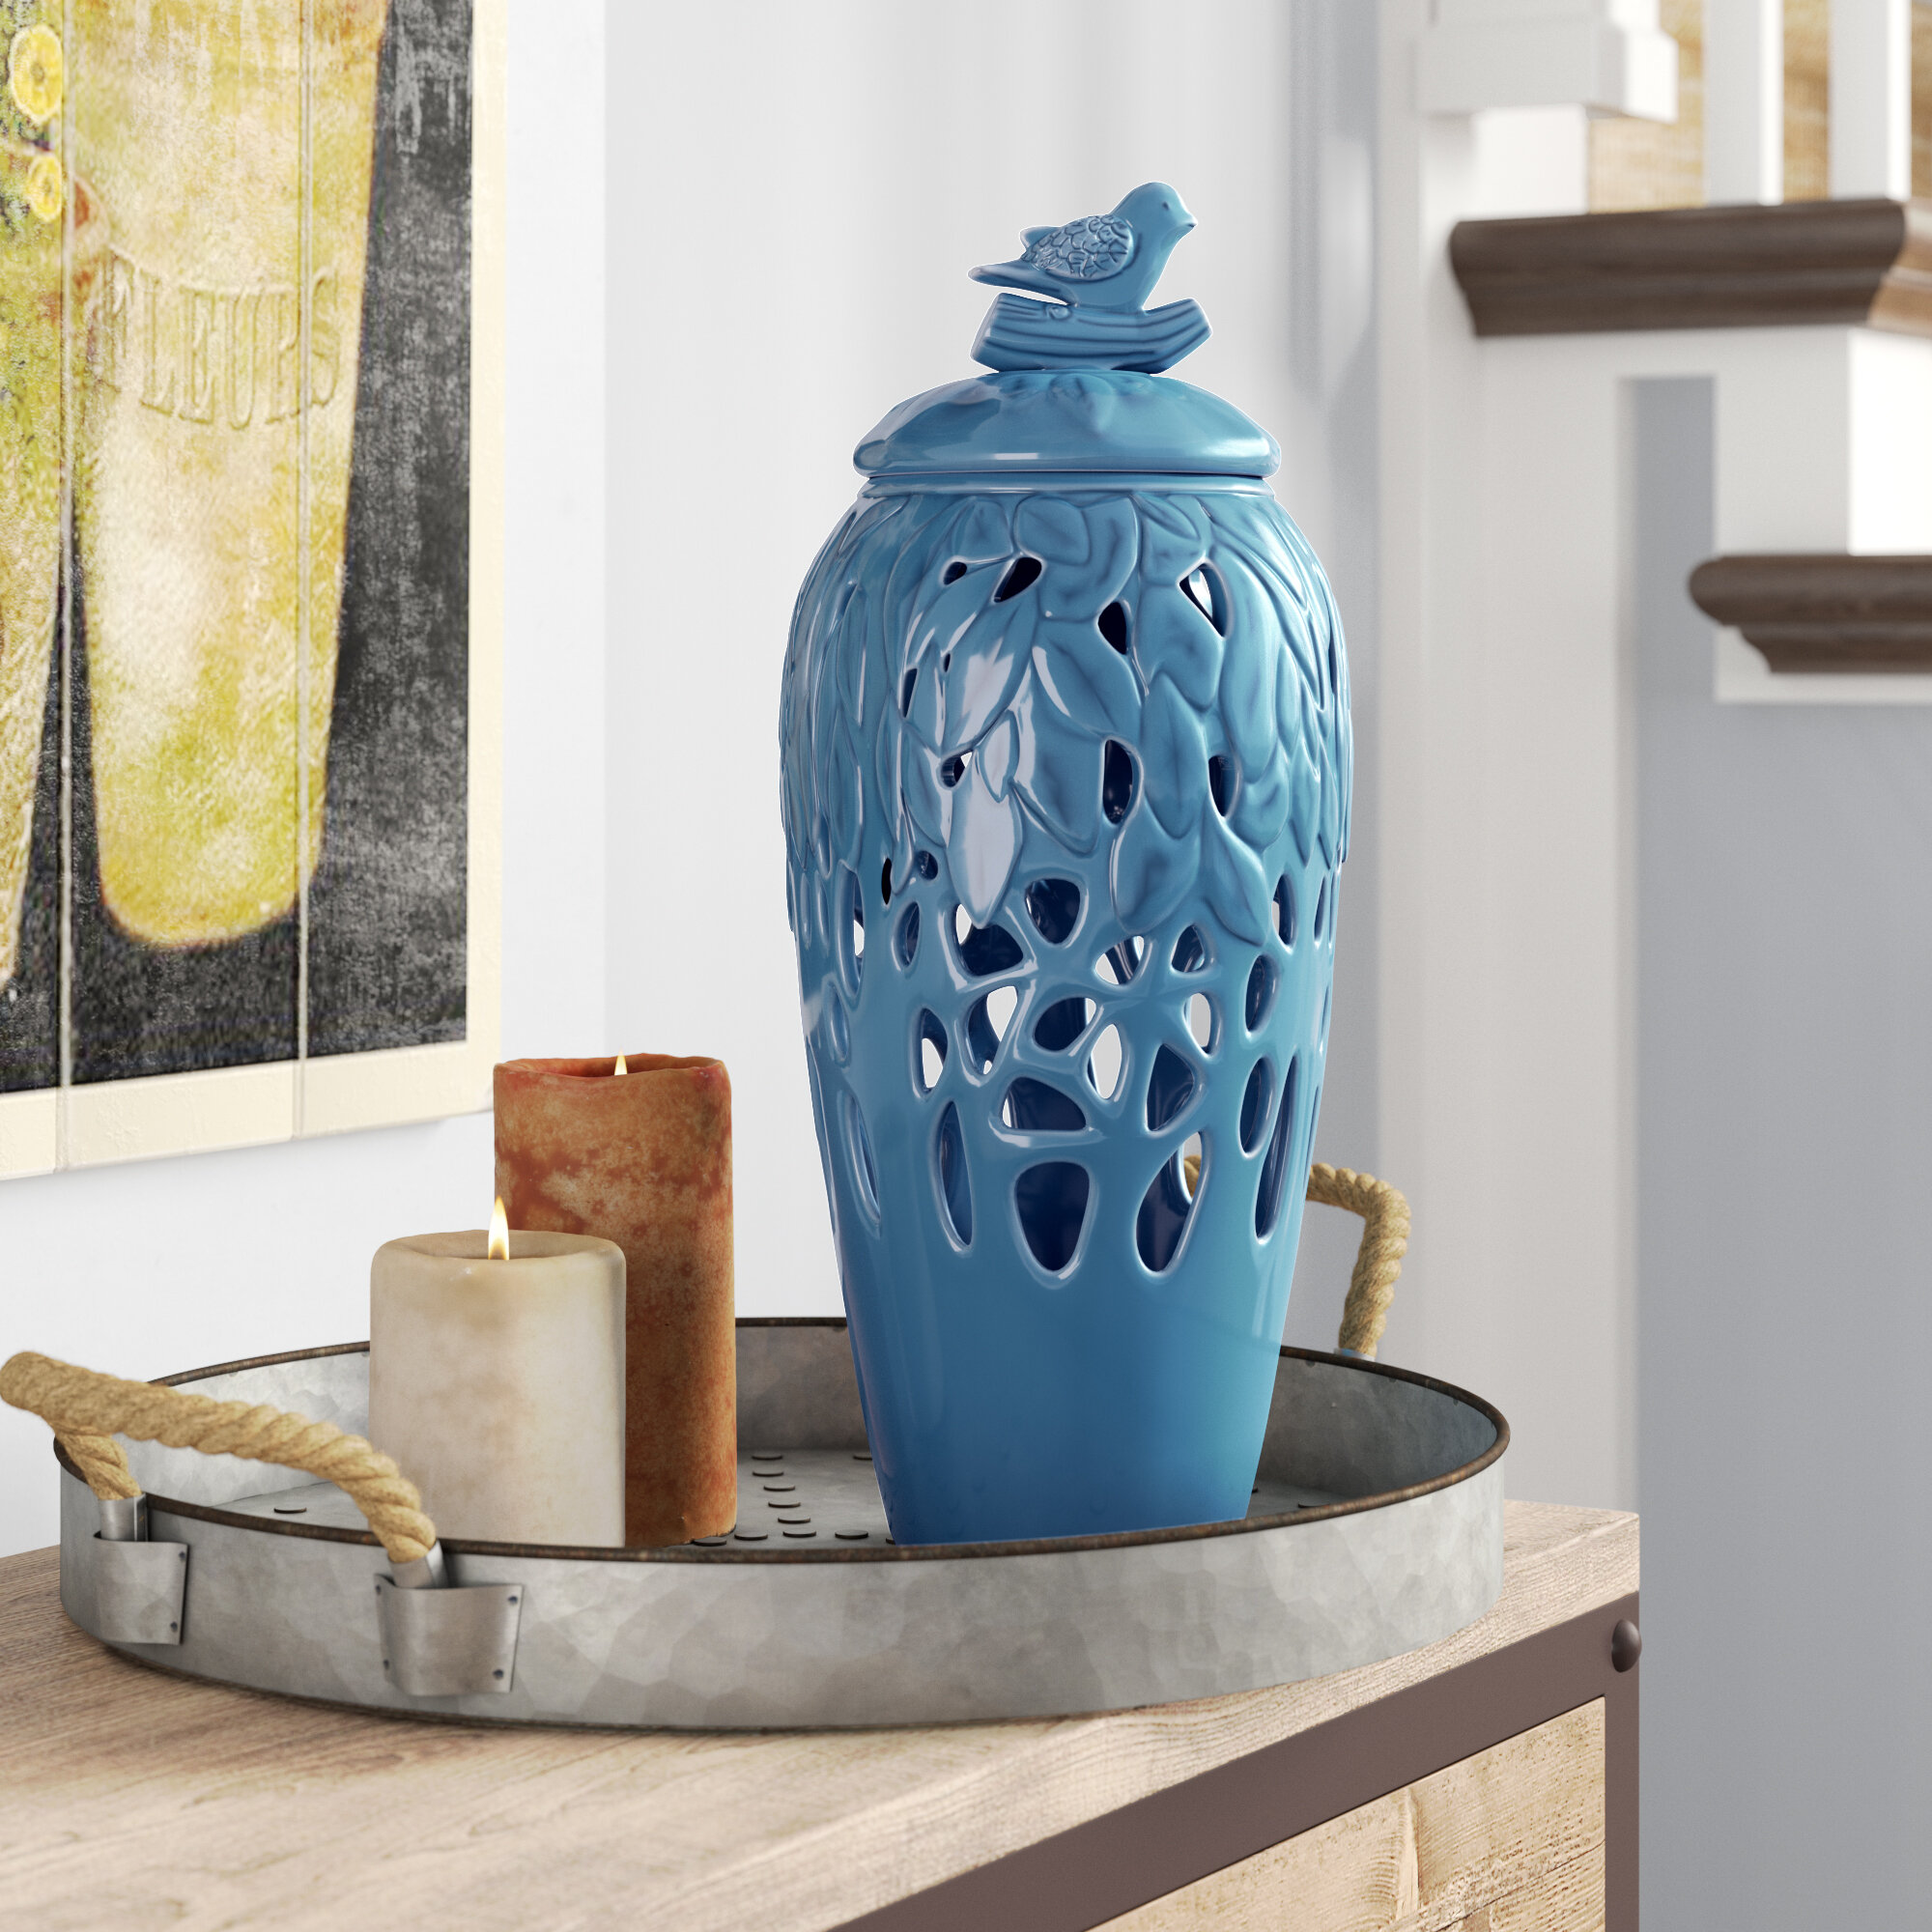 Medium Urns Jars Vases Urns Jars Bottles You Ll Love In 2021 Wayfair